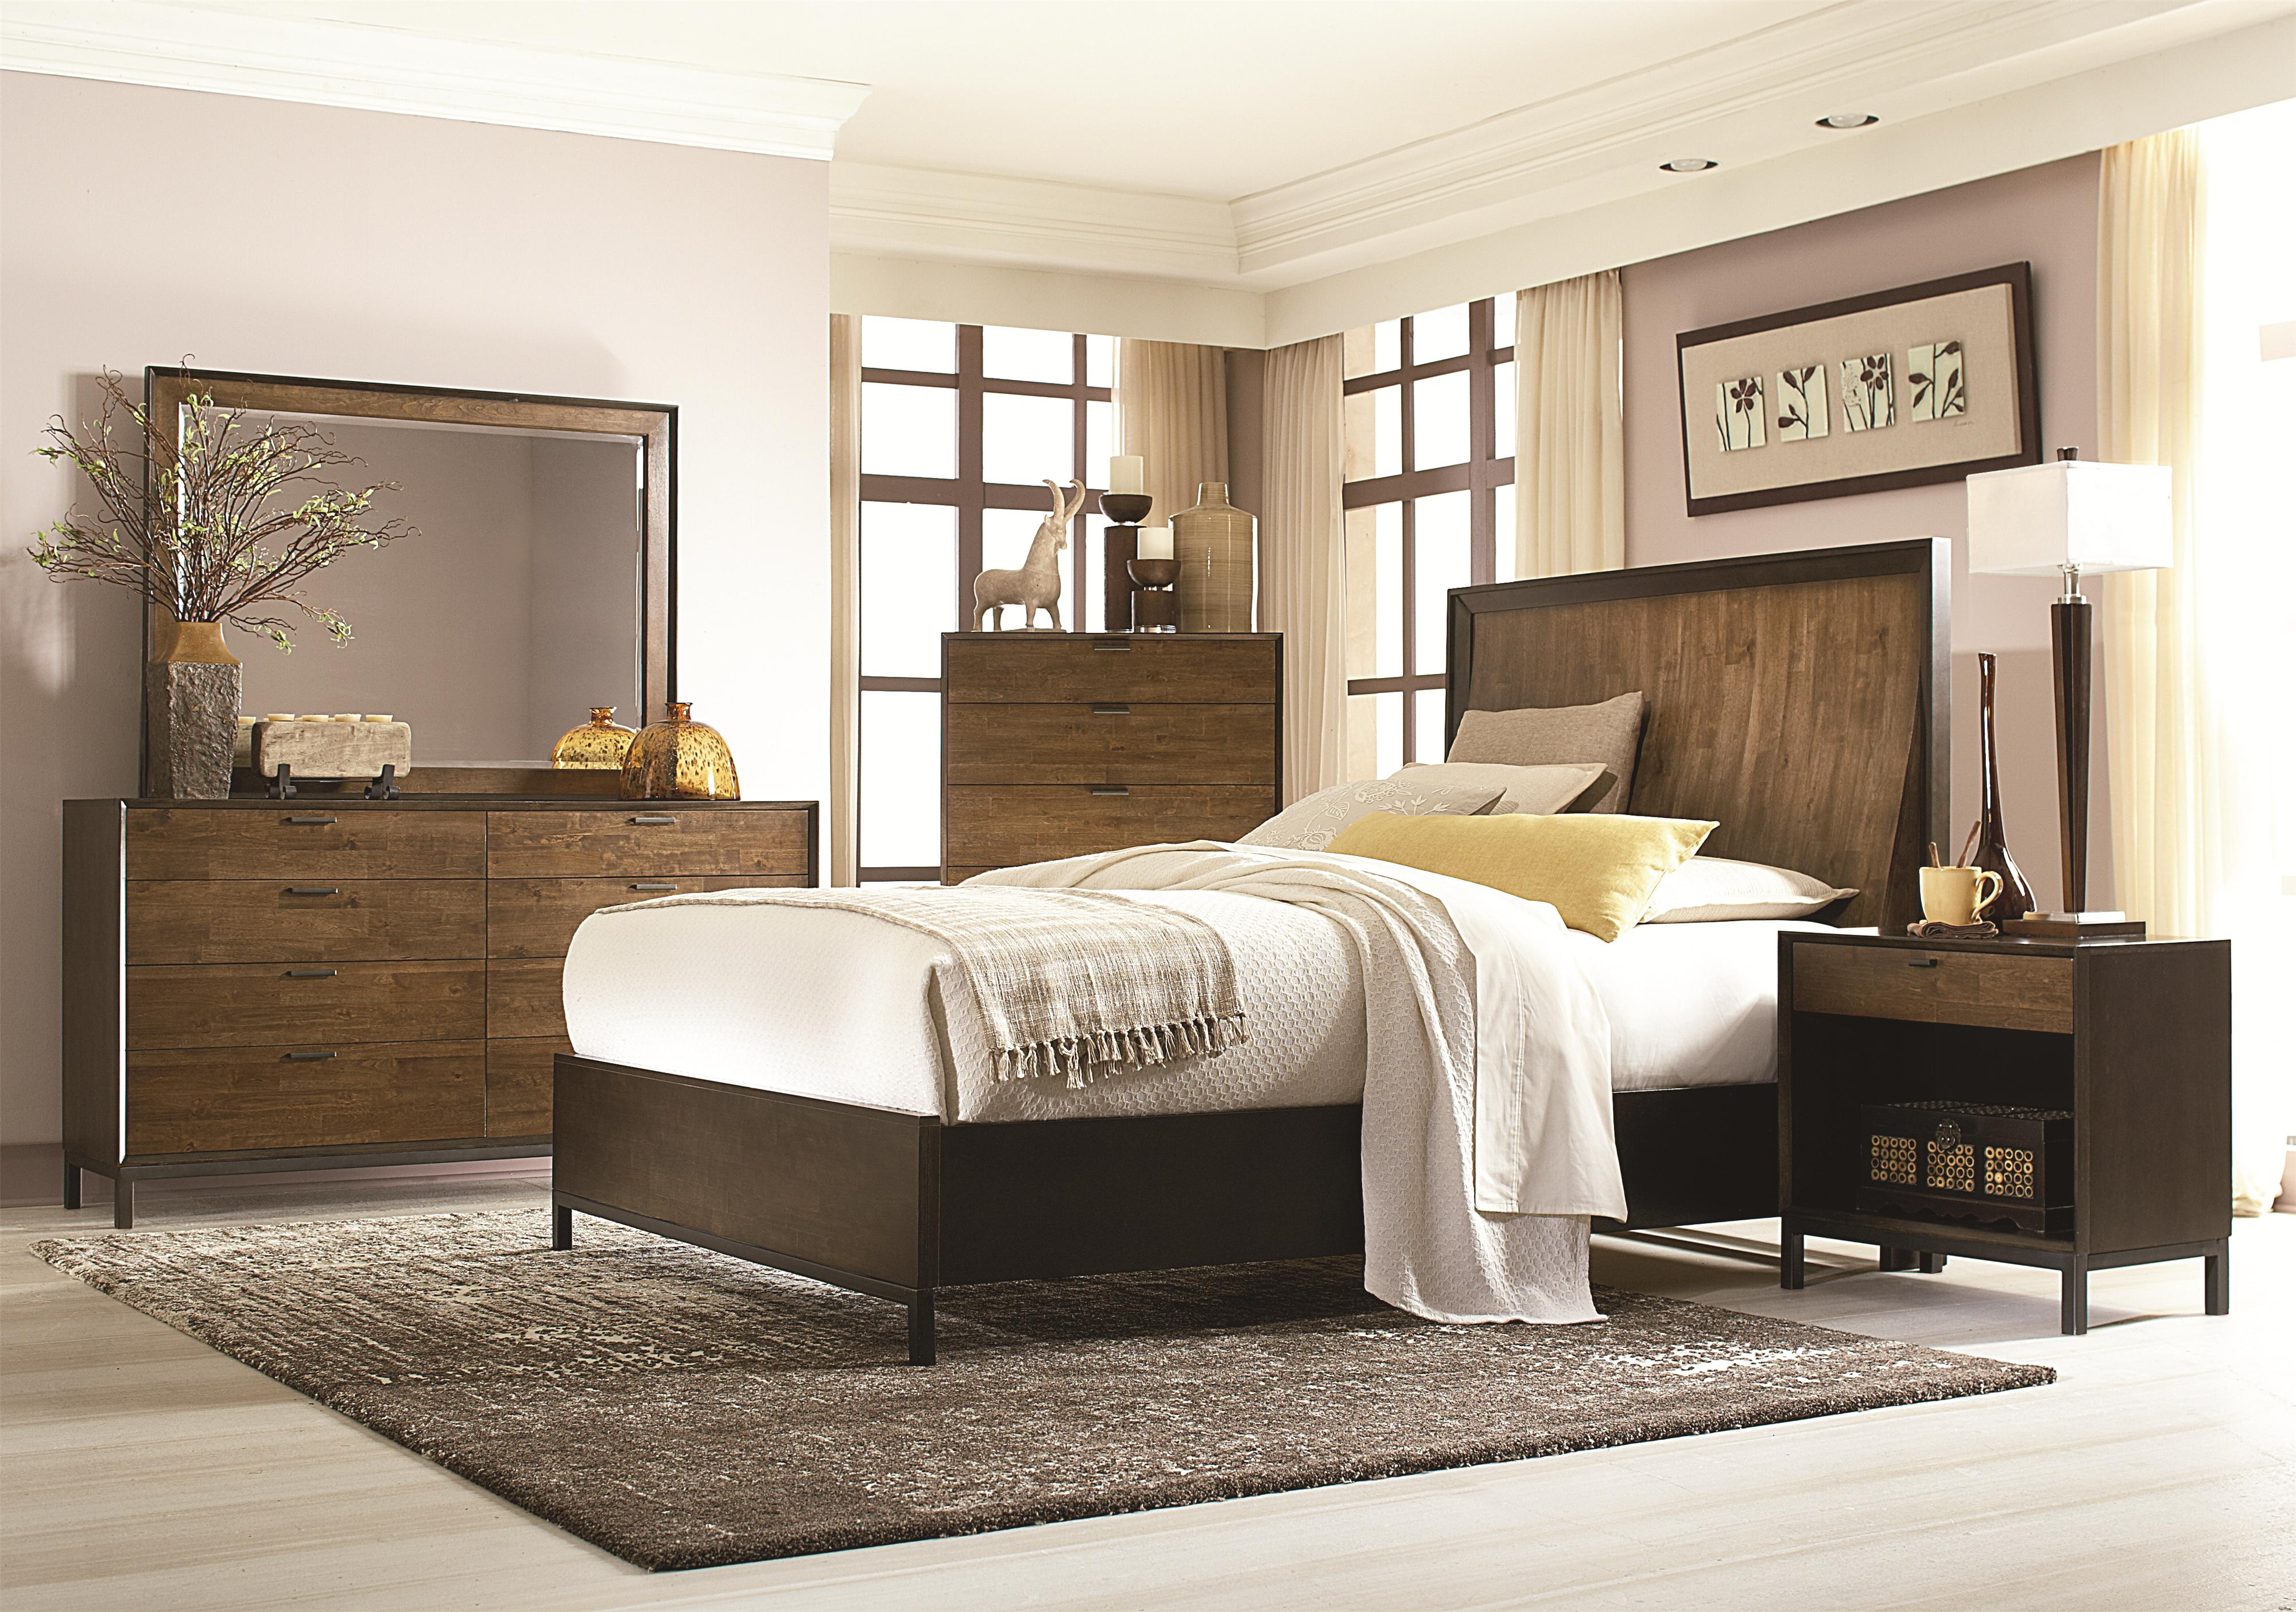 Kateri 3600 By Legacy Clic Crowley Furniture Mattress Dealer